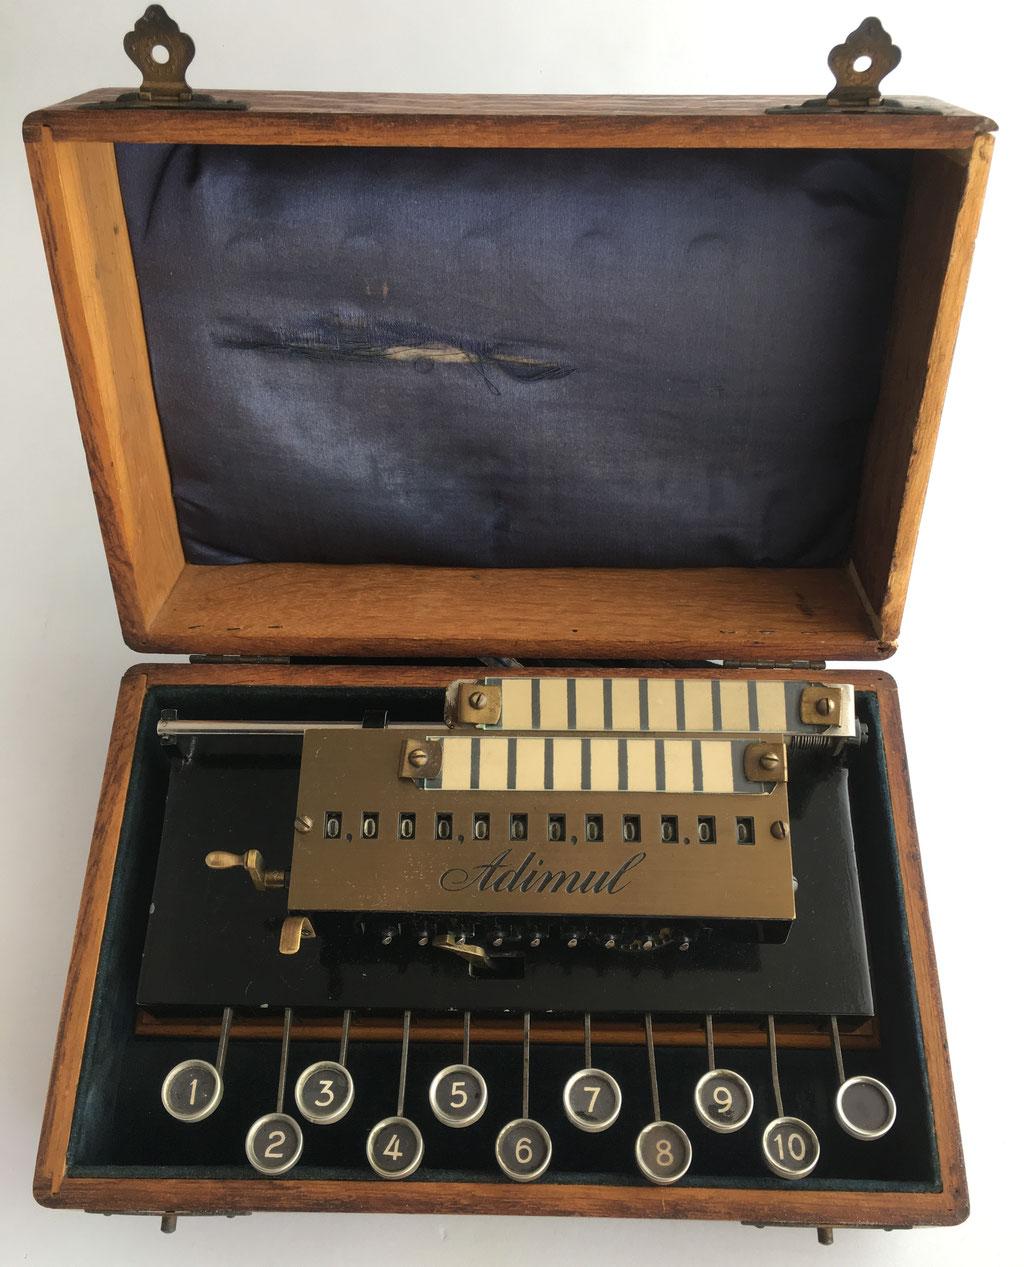 "Calculadora ADIMUL, hecha por Adix Company Pallweber & Bordt, Mannheim, nº serie 1012, año 1909. Es la ""KULI"" comercializada en Francia con el nombre ADIMUL"